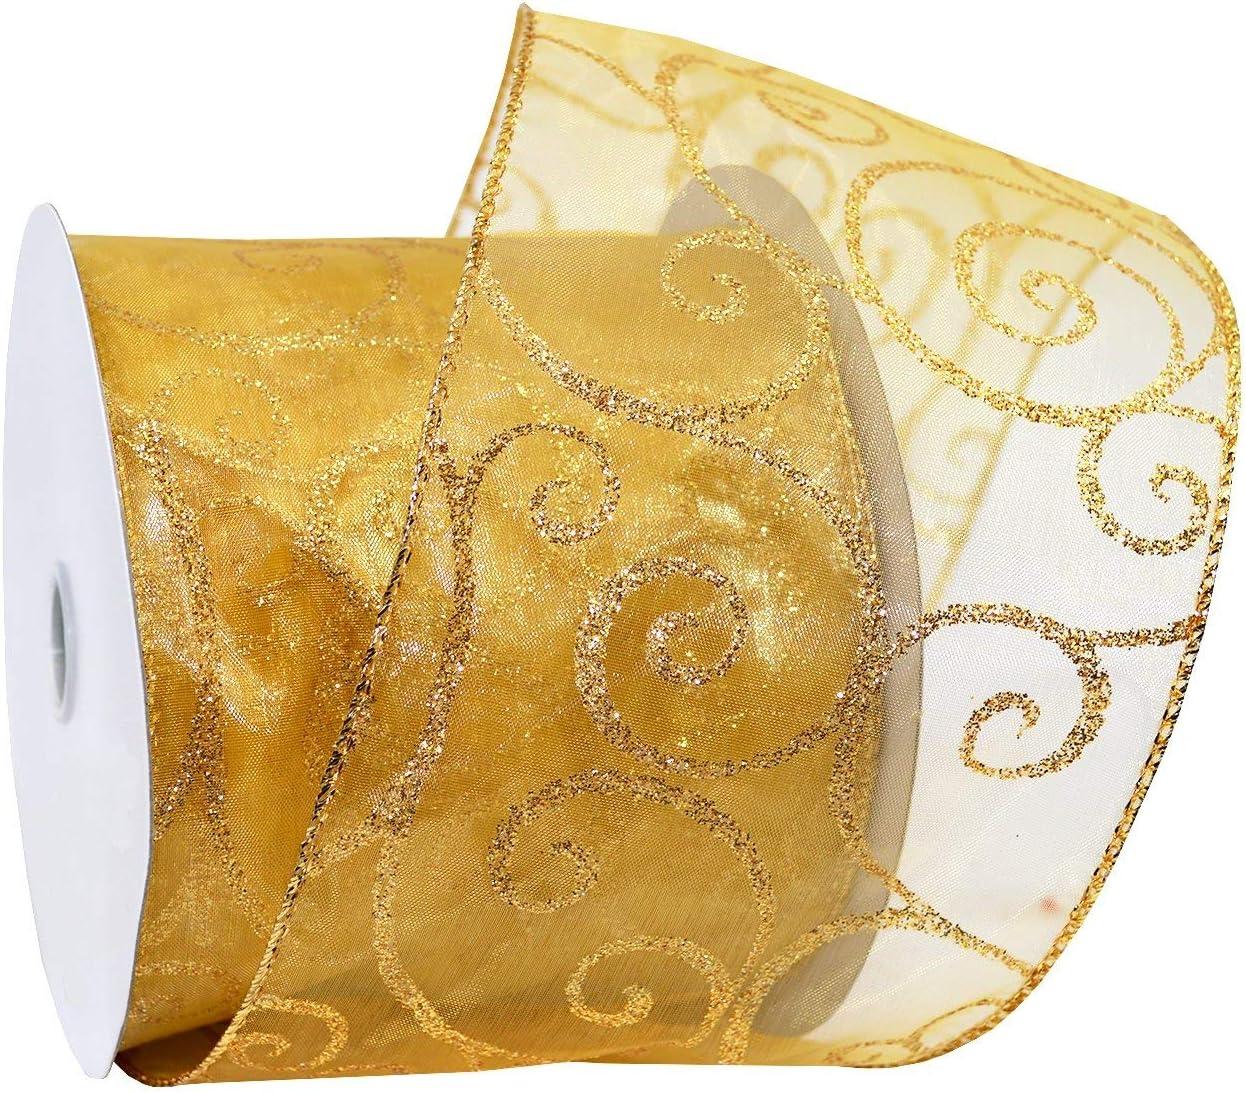 Amazon Com Morex Ribbon Swirl Wired Sheer Glitter Ribbon 4 Inch By 25 Yard Spool Gold Gold